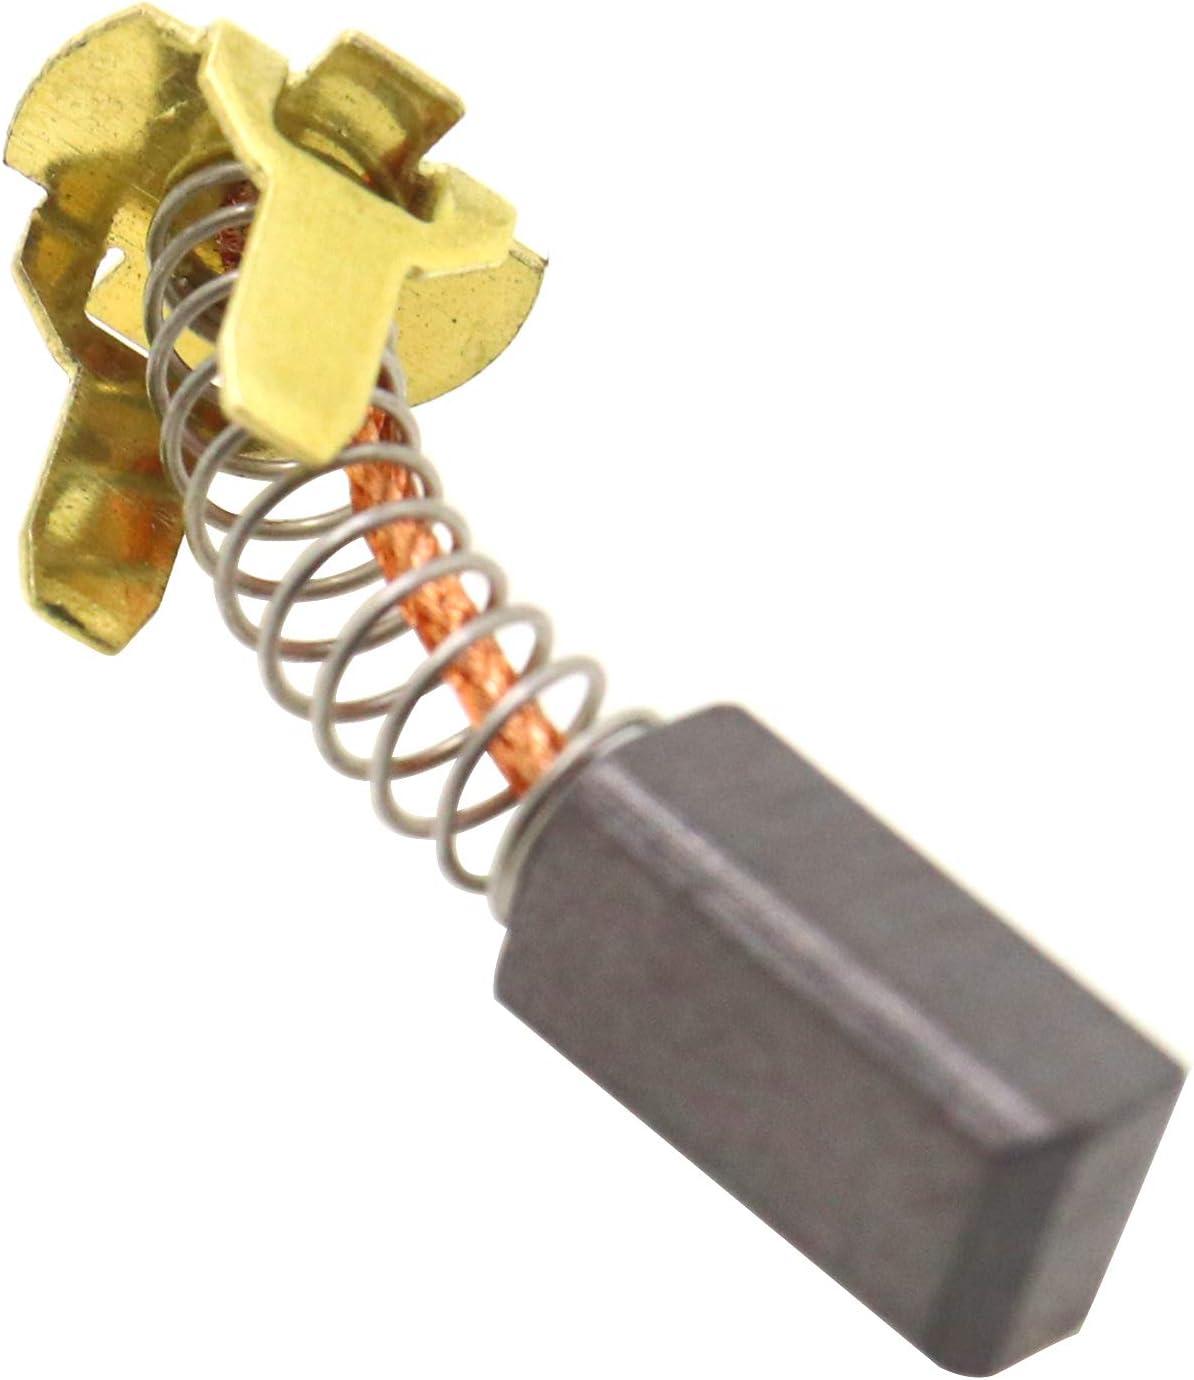 2 piezas//4 piezas Rectificadora de cepillos de carbono ENET 999-054 compatible con Hitachi G18DL G18DMR G18DSL G14DL G14DMR G14DSL